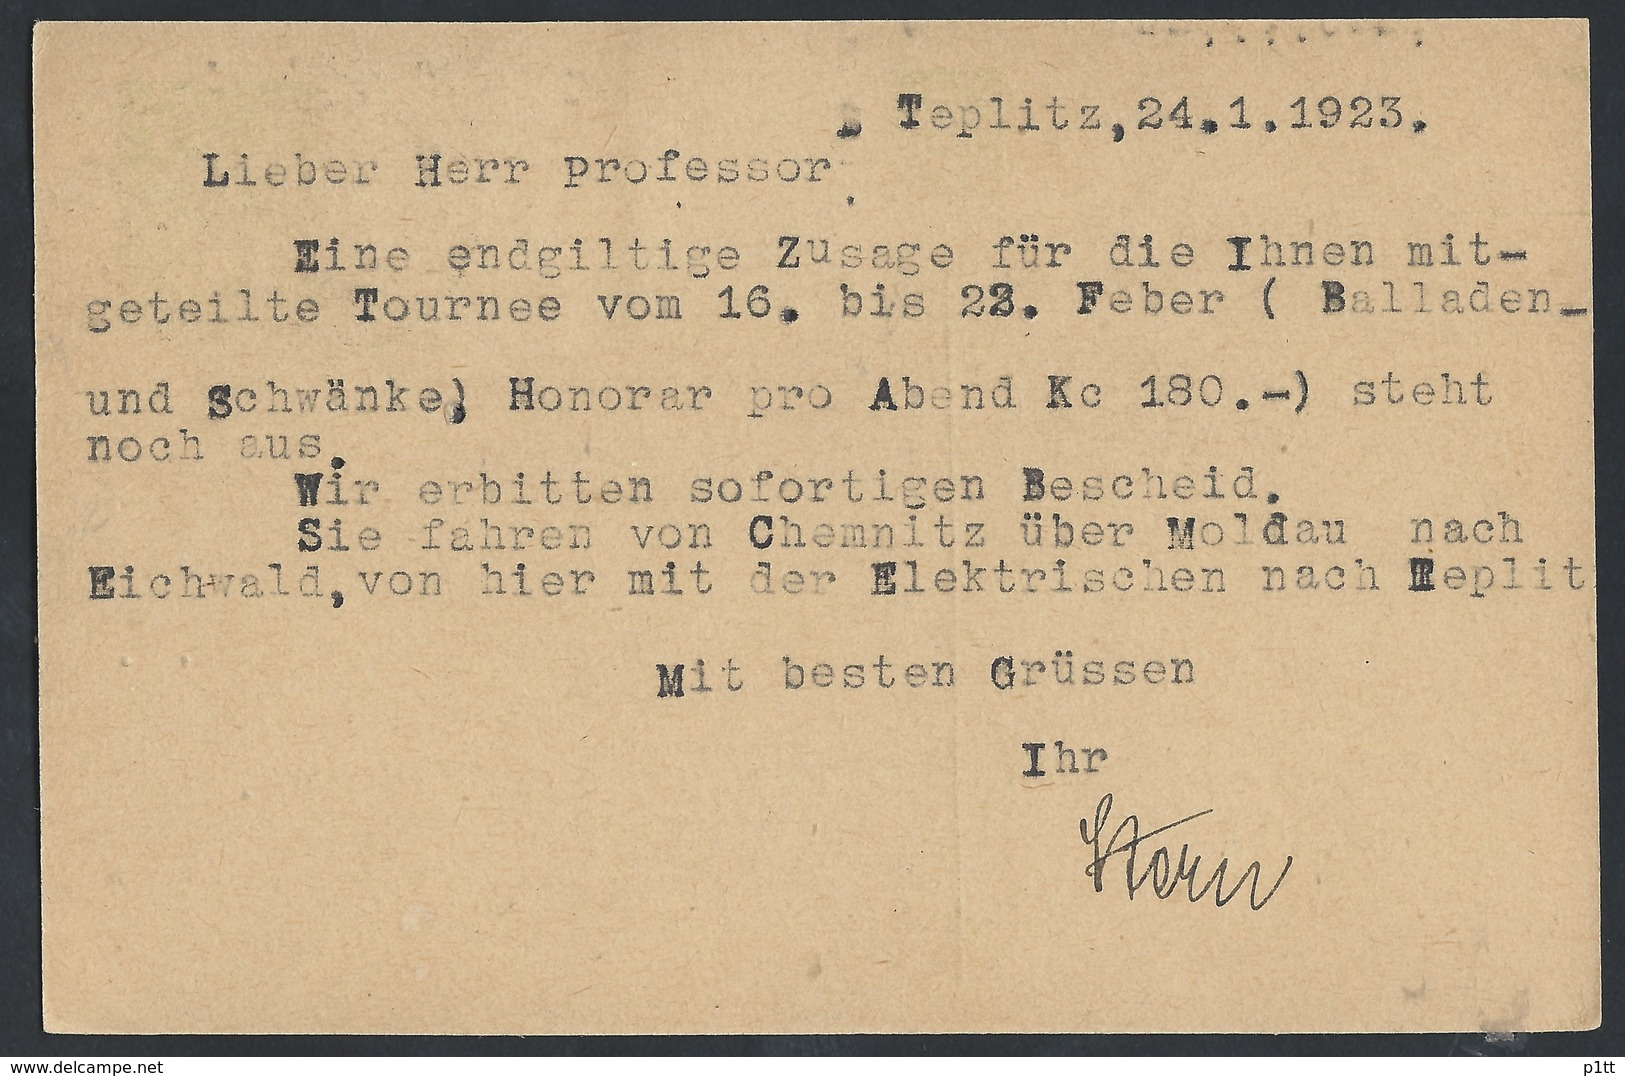 2ch.Postcard. The Mail Went To 1923 Teplice Berlin. Professor Of Art History - Tschechoslowakei/CSSR